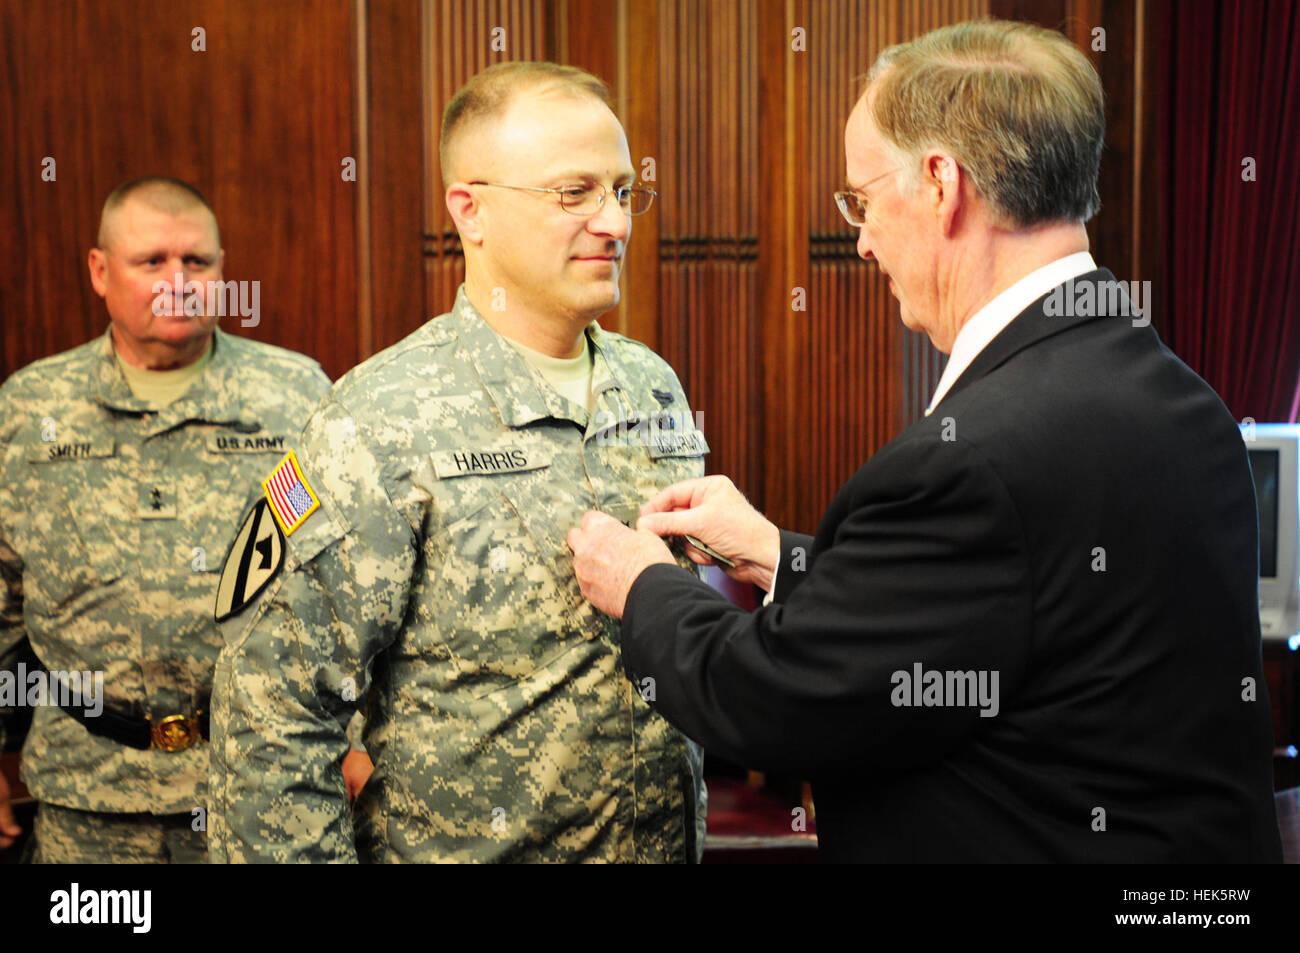 Alabama Gov. Robert Bentley promotes Alabama Army National Guard Col. Brian C. Harris to Brig. Gen. in a ceremony - Stock Image